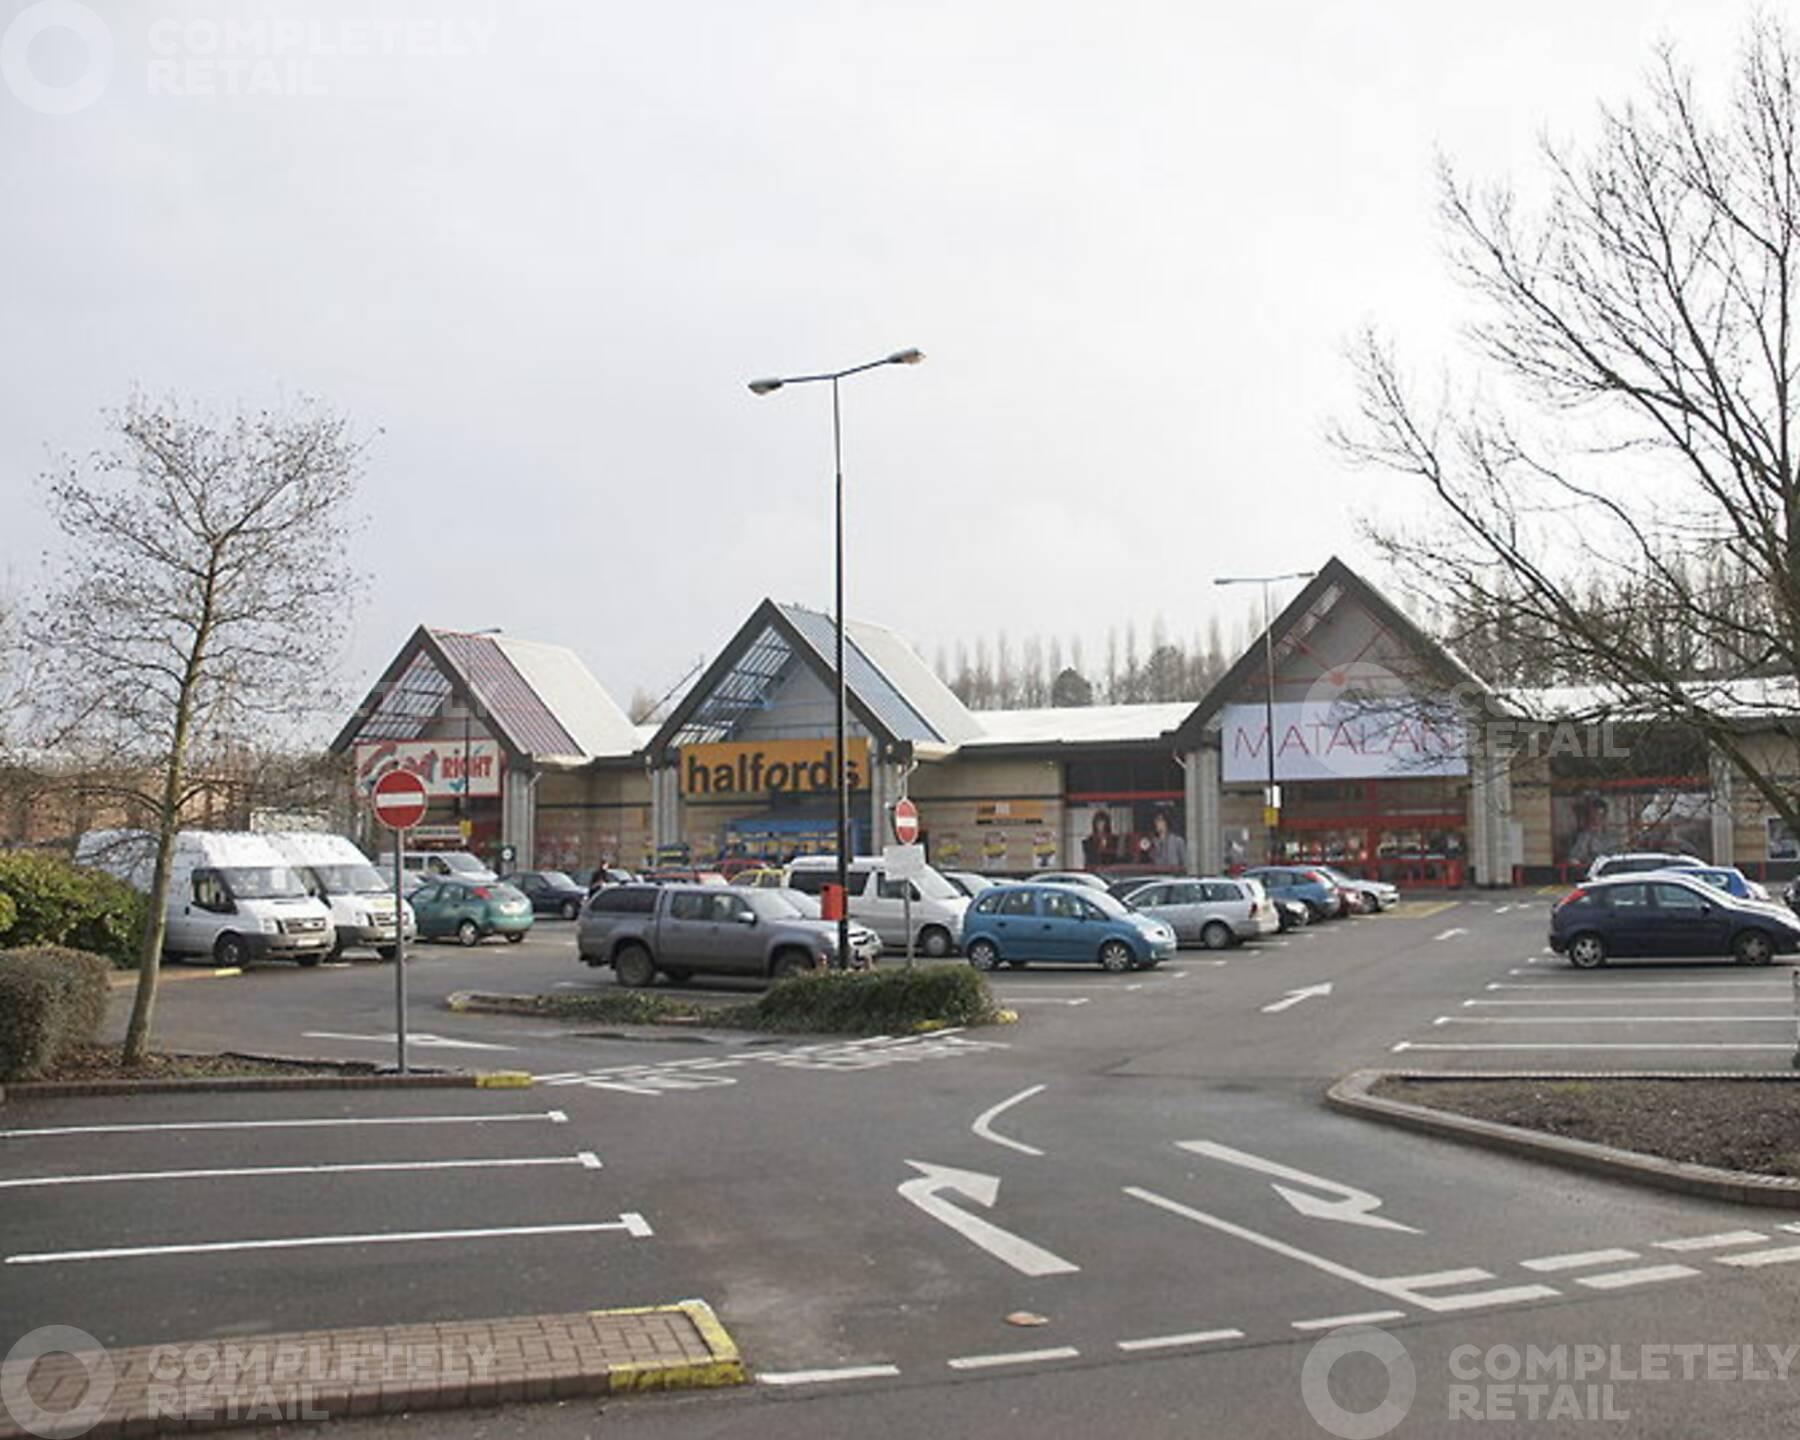 Abbey View Retail Park